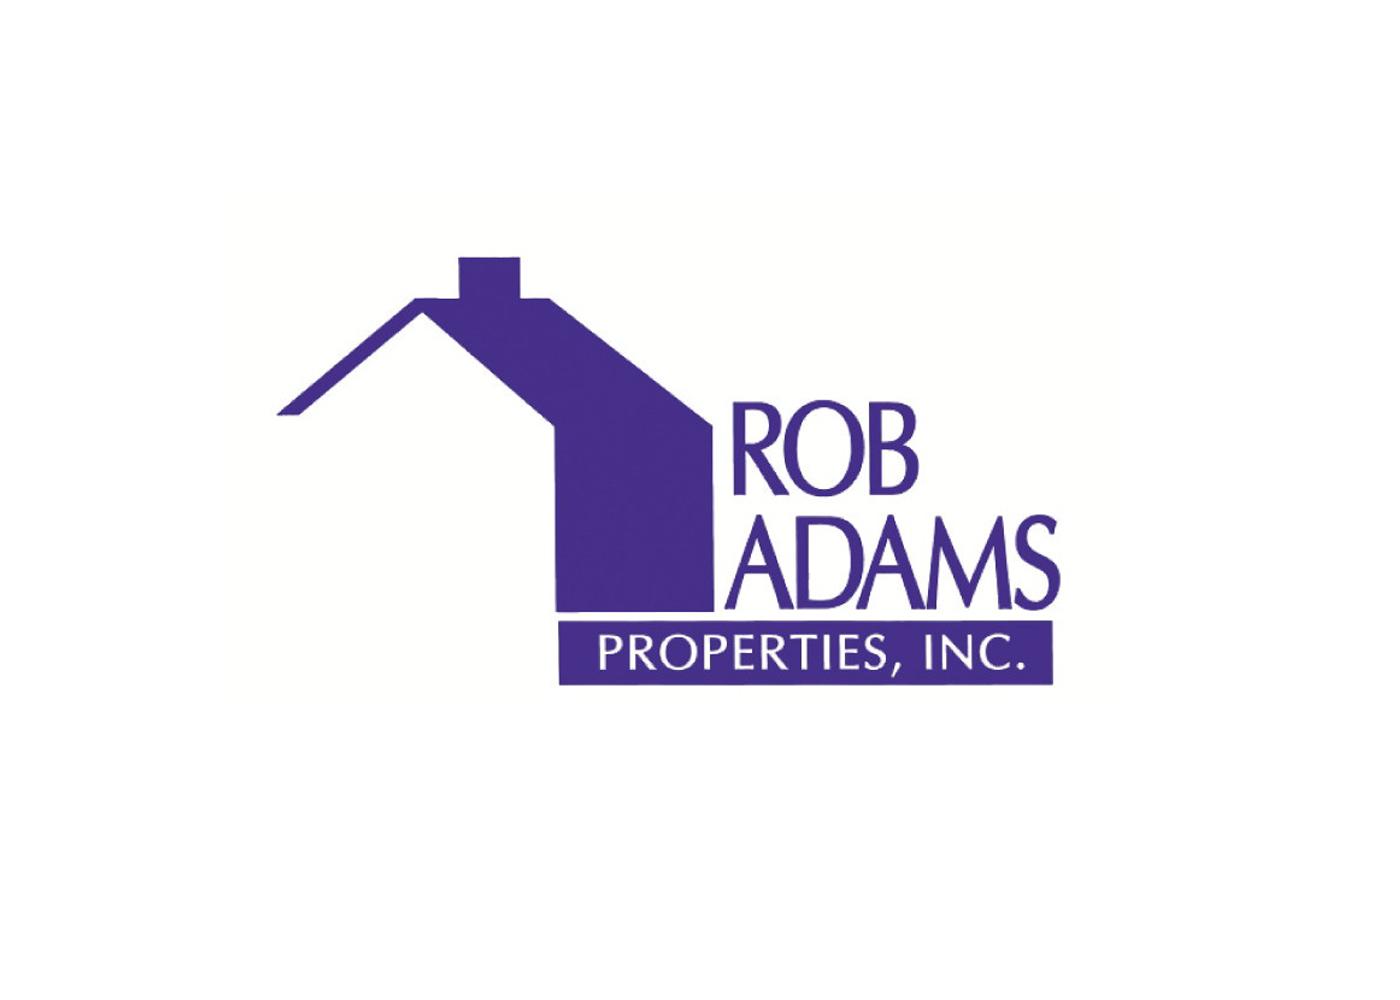 Rob Adams Properties, Inc.